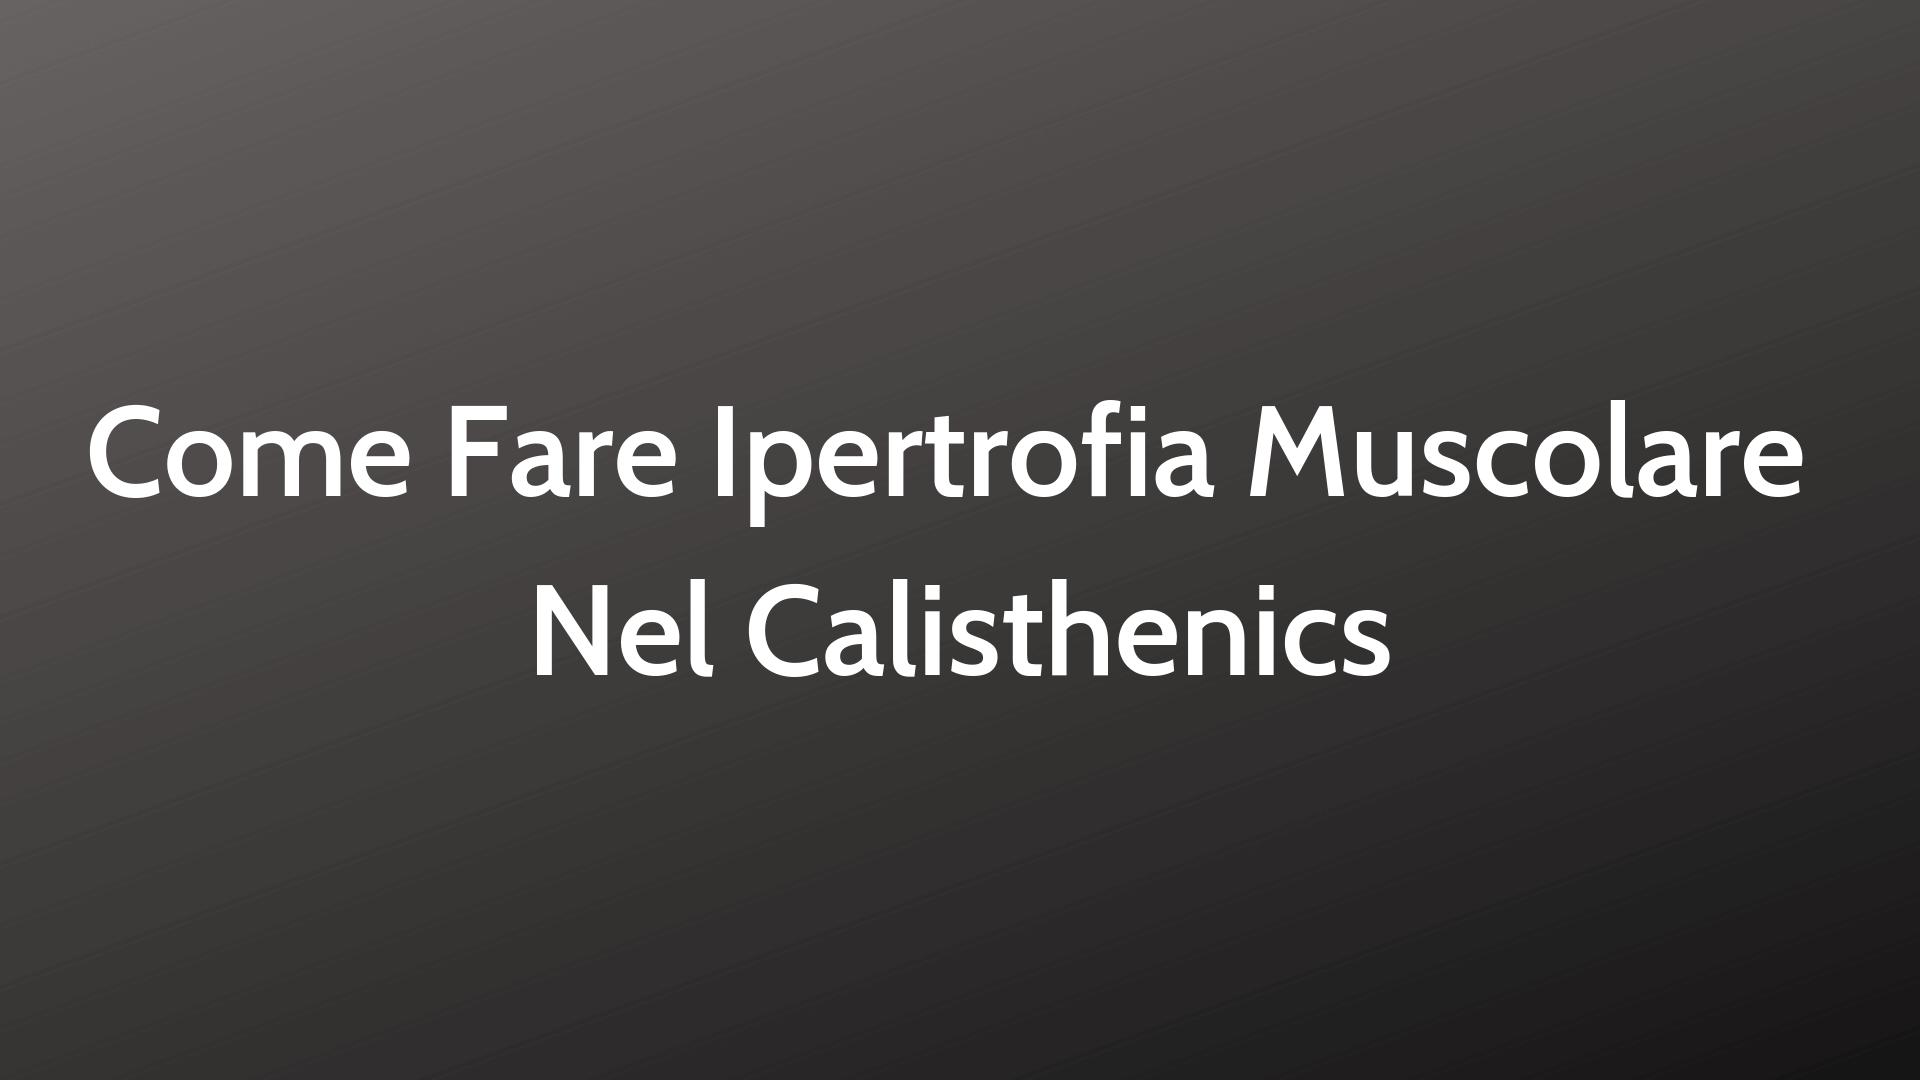 ipertrofia calisthenics